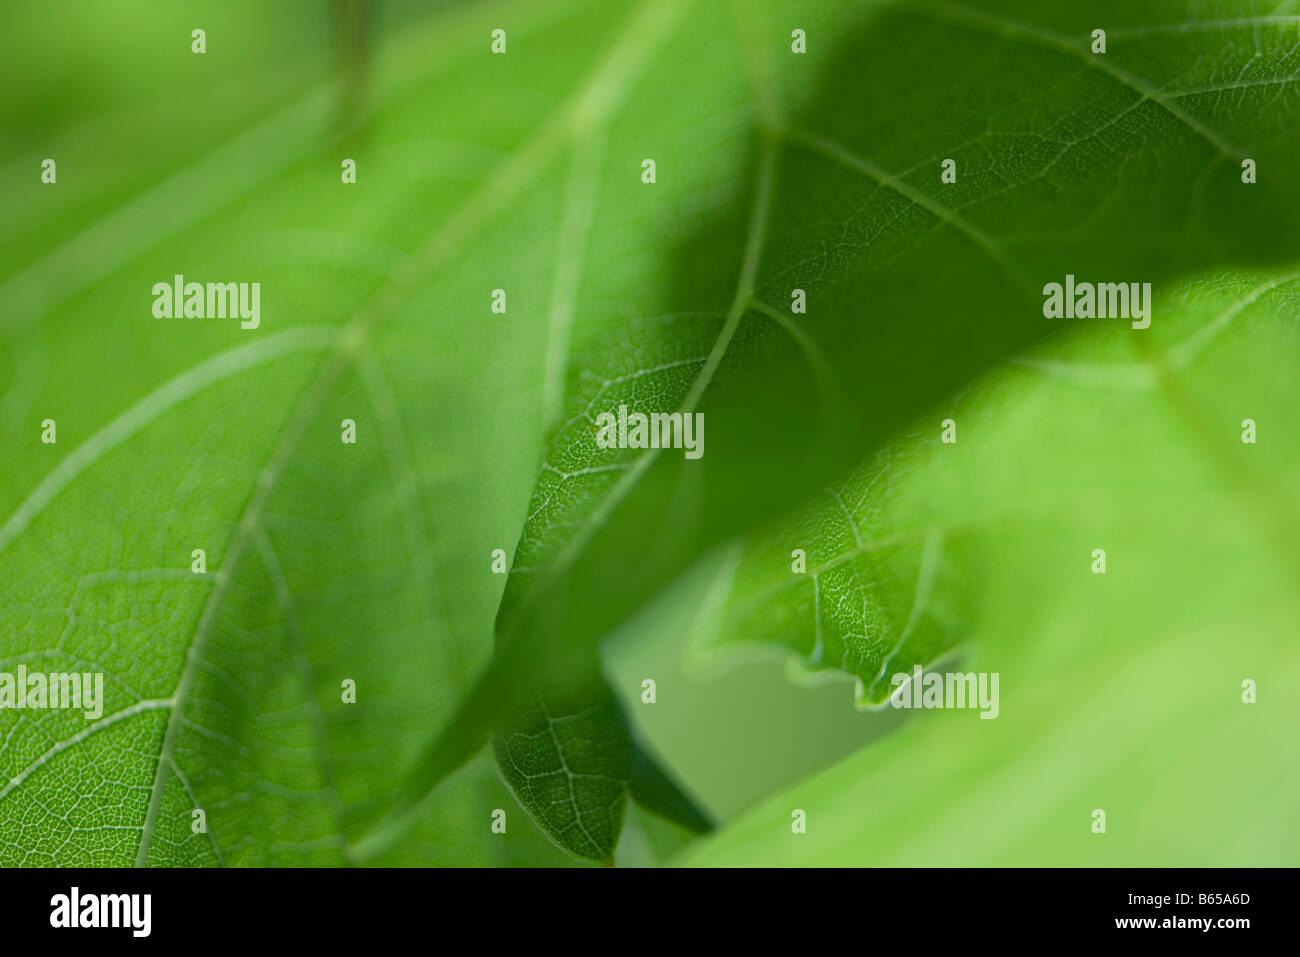 Green foliage, extreme close-up - Stock Image